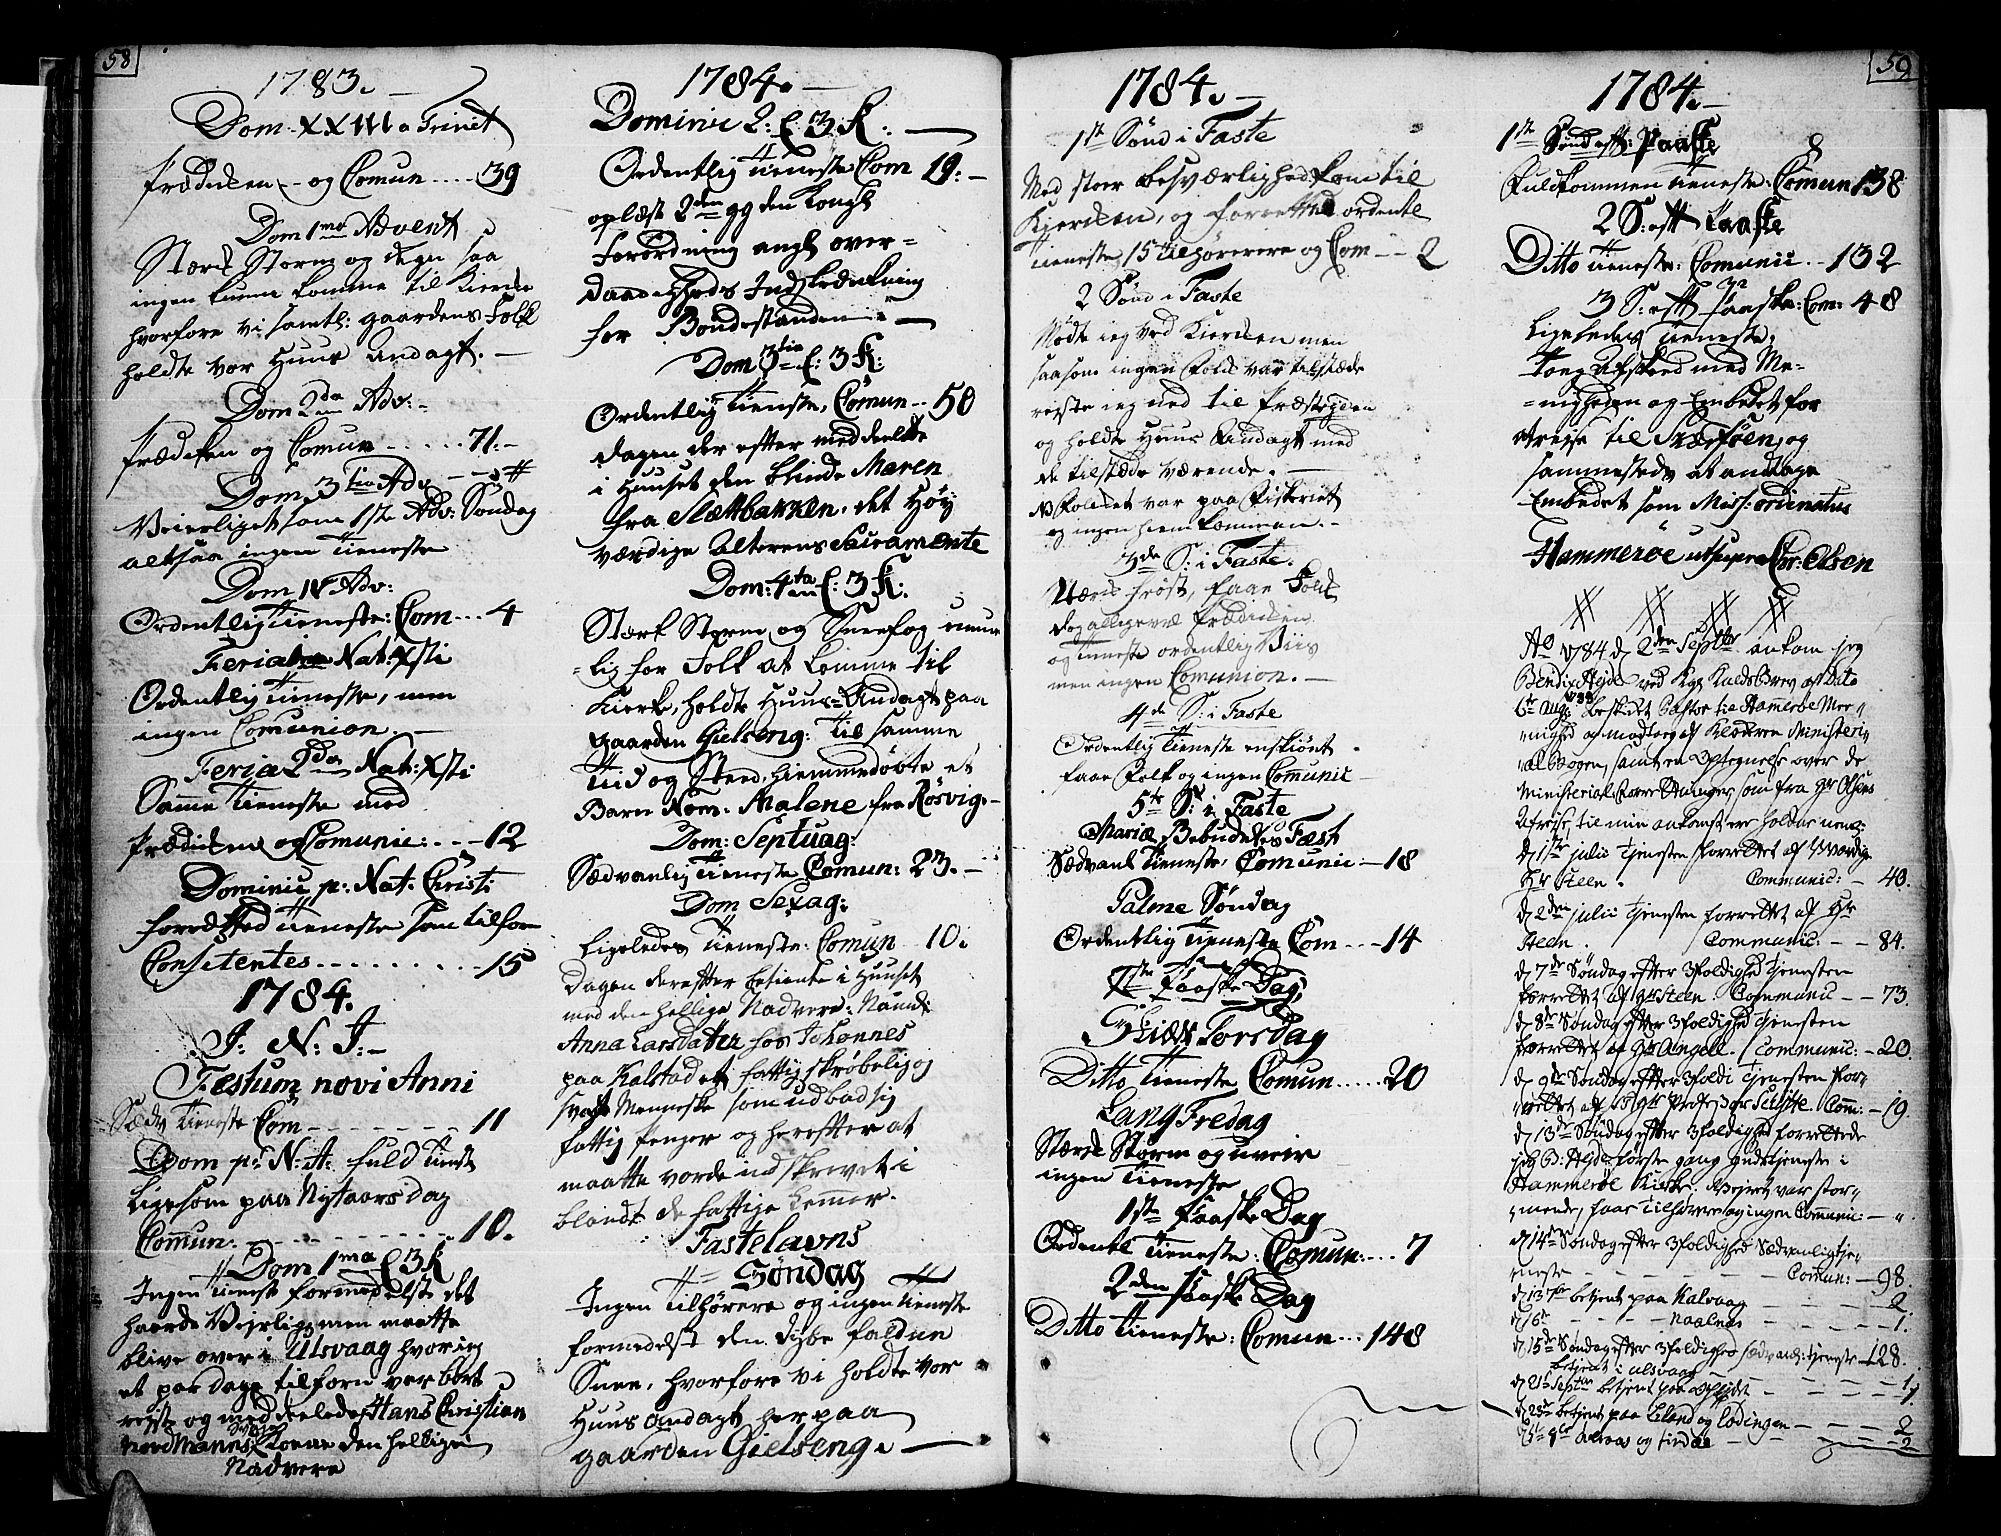 SAT, Ministerialprotokoller, klokkerbøker og fødselsregistre - Nordland, 859/L0841: Ministerialbok nr. 859A01, 1766-1821, s. 58-59